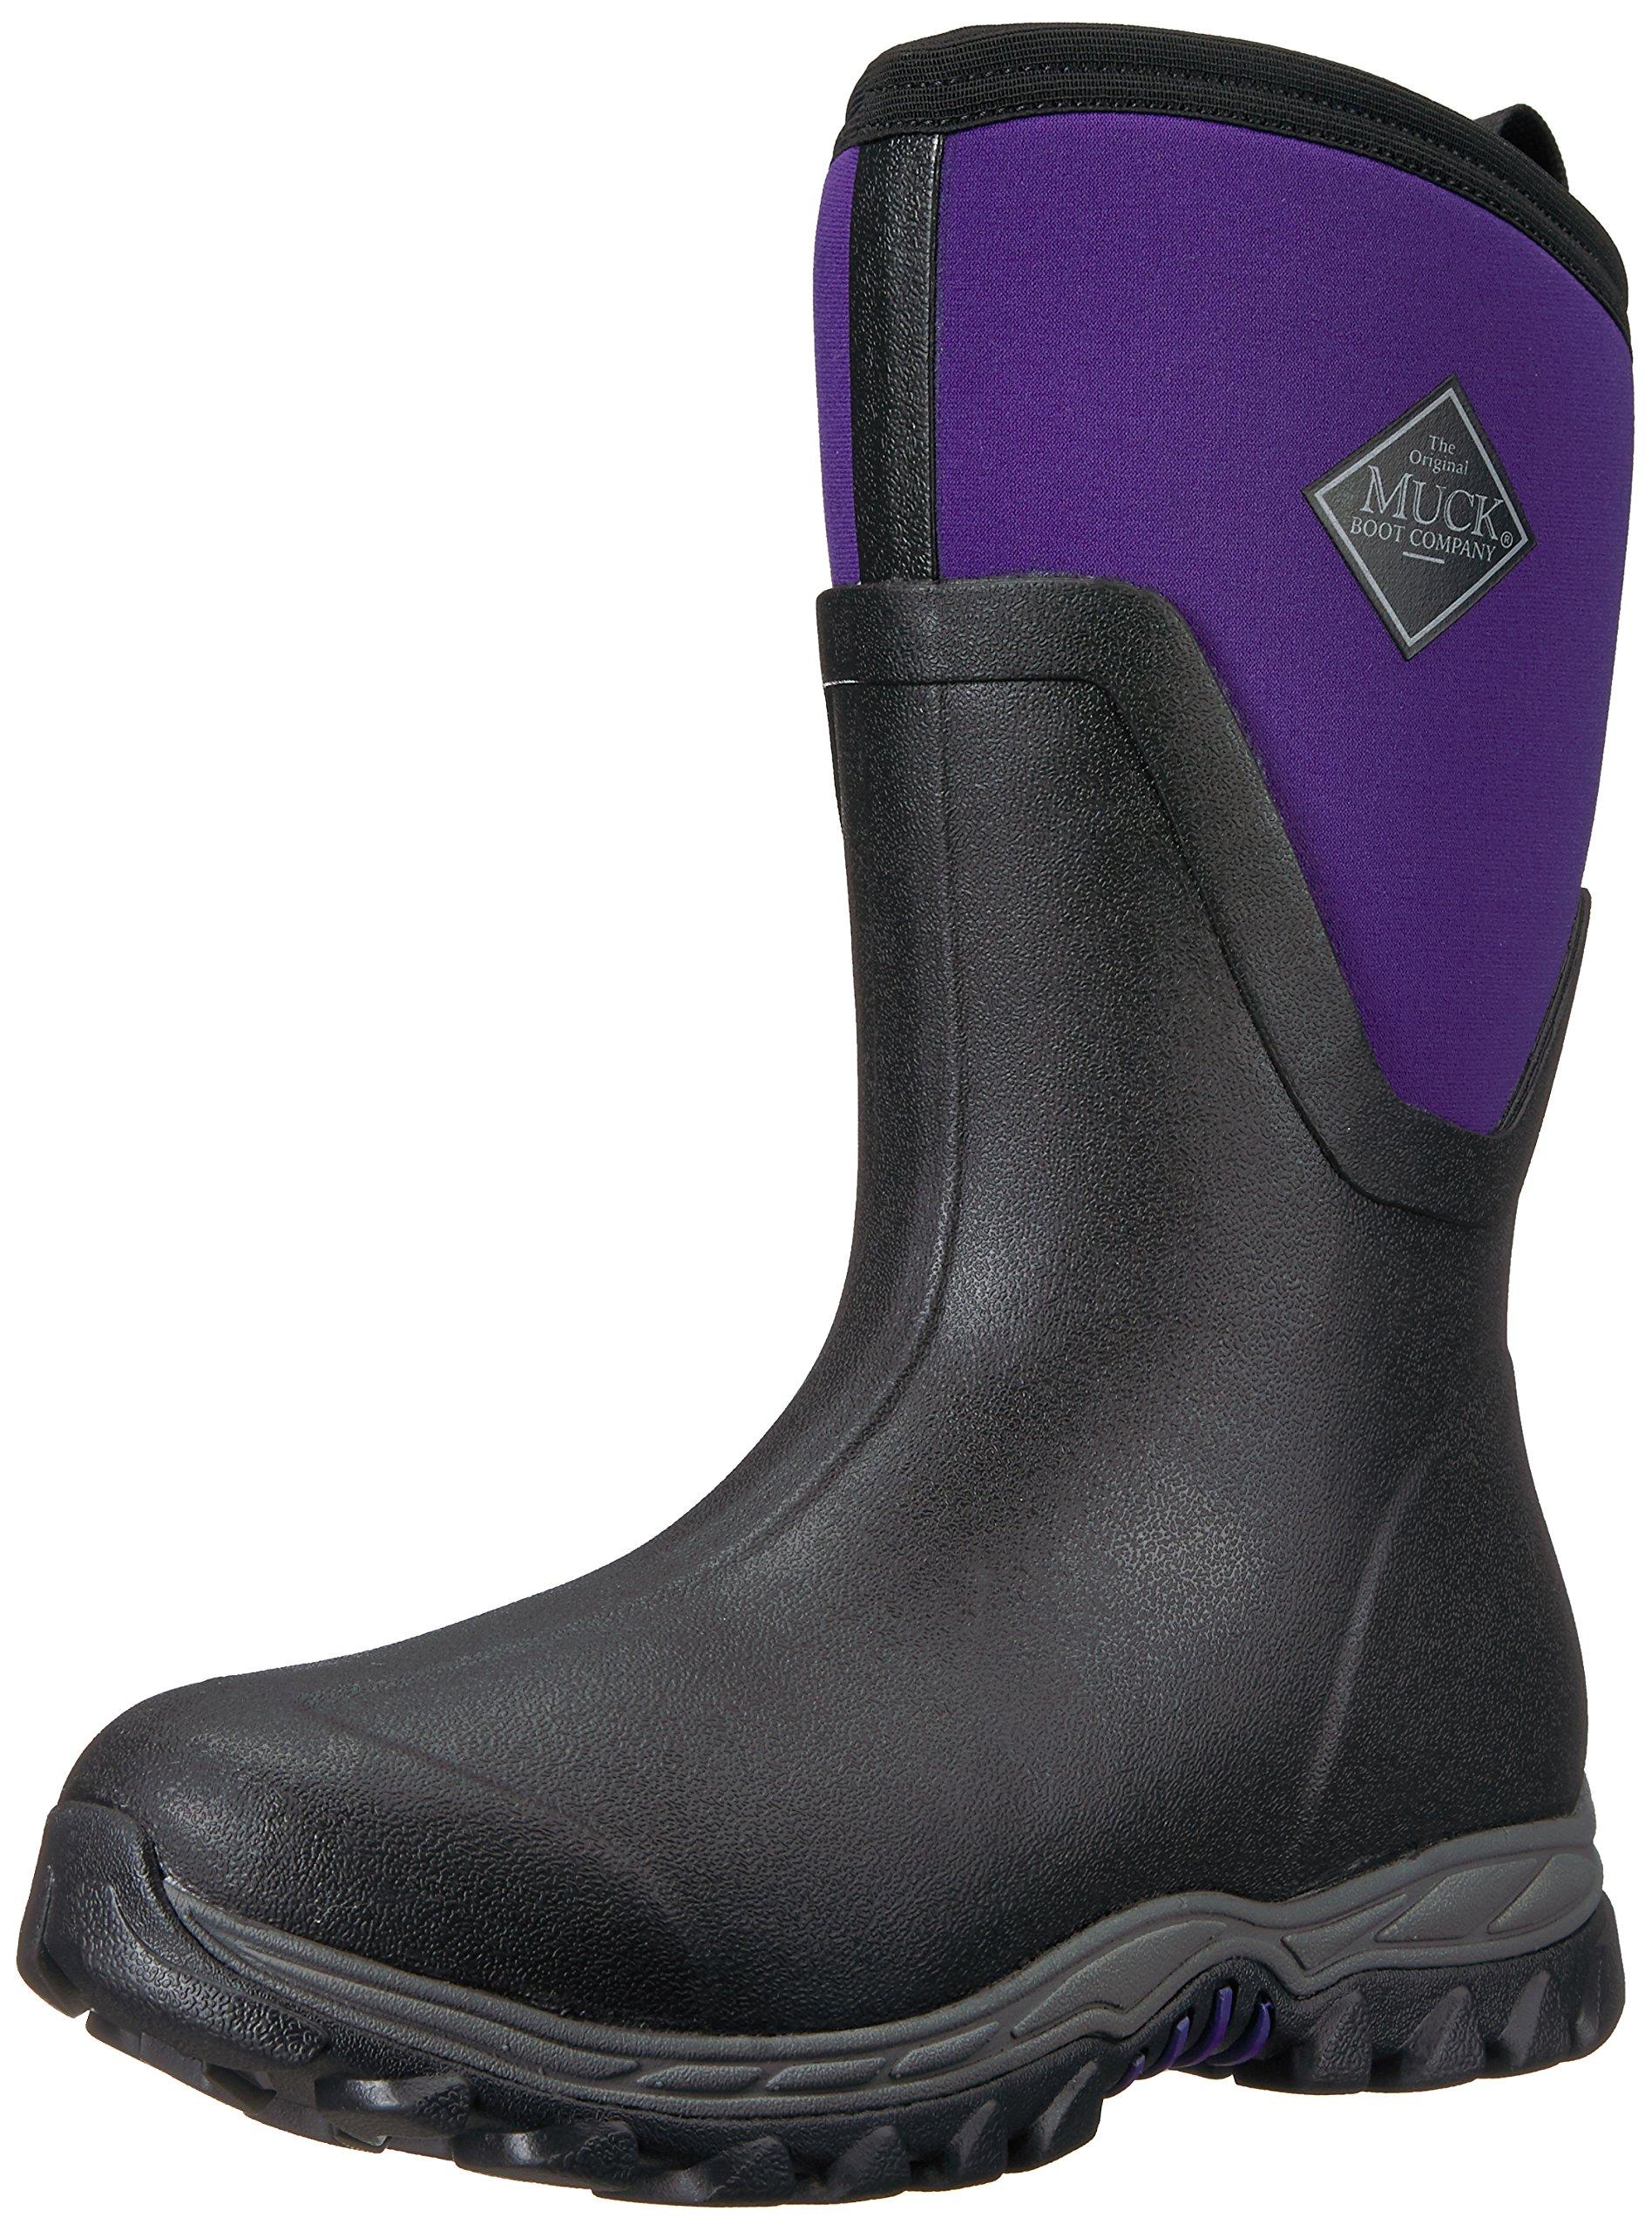 Muck Boot Women's Arctic Sport II Mid Snow Boot, Black/Parachute Purple, 9 B US